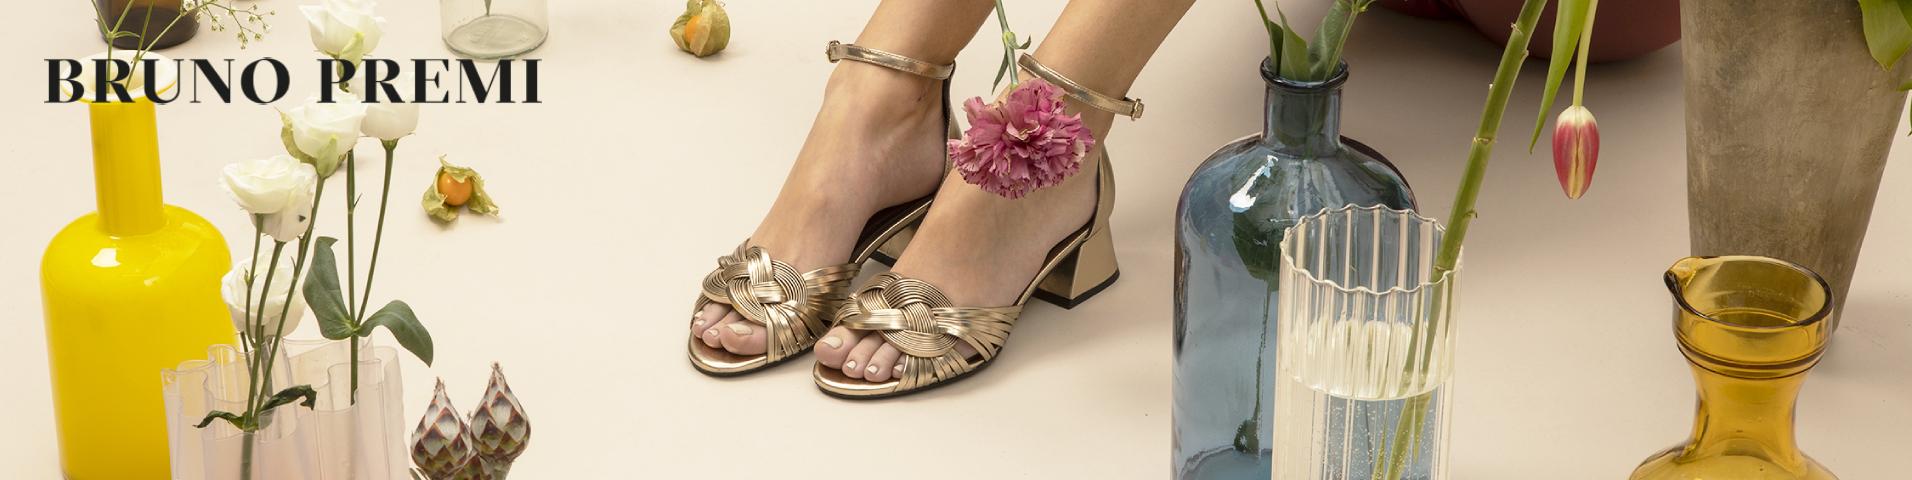 Scarpe donna Bruno Premi | Grande assortimento di calzature